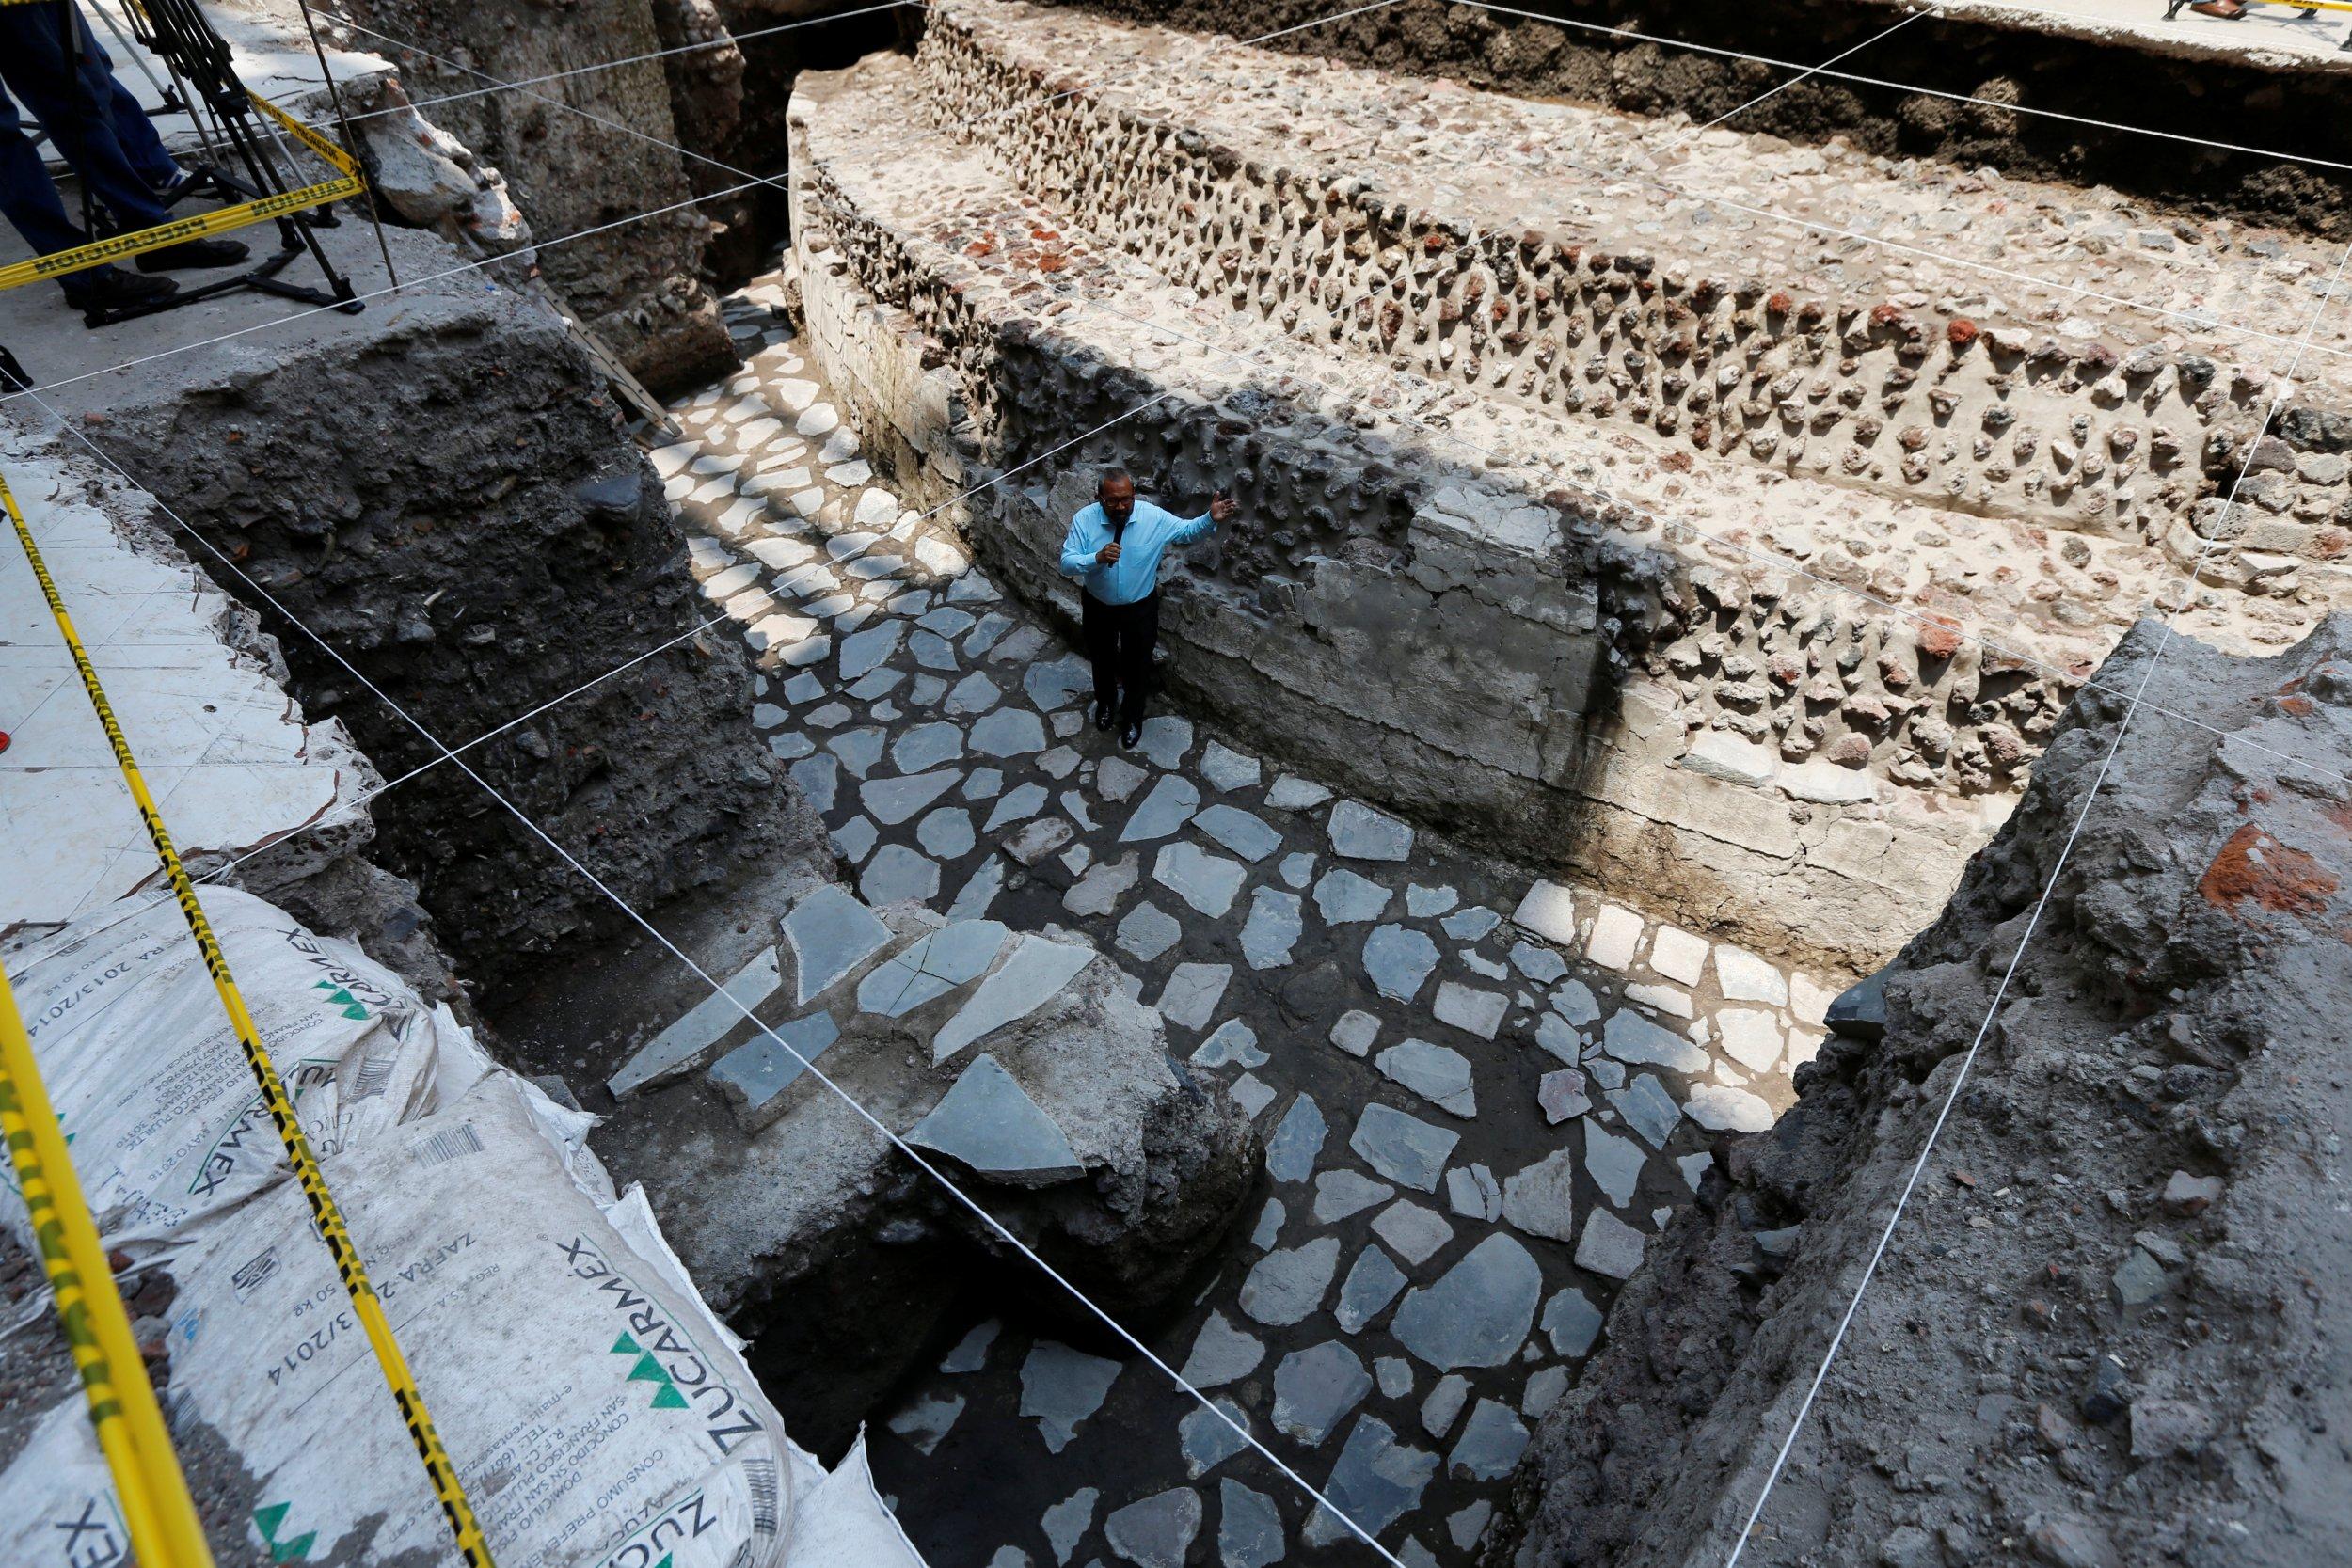 Aztec archaeology site